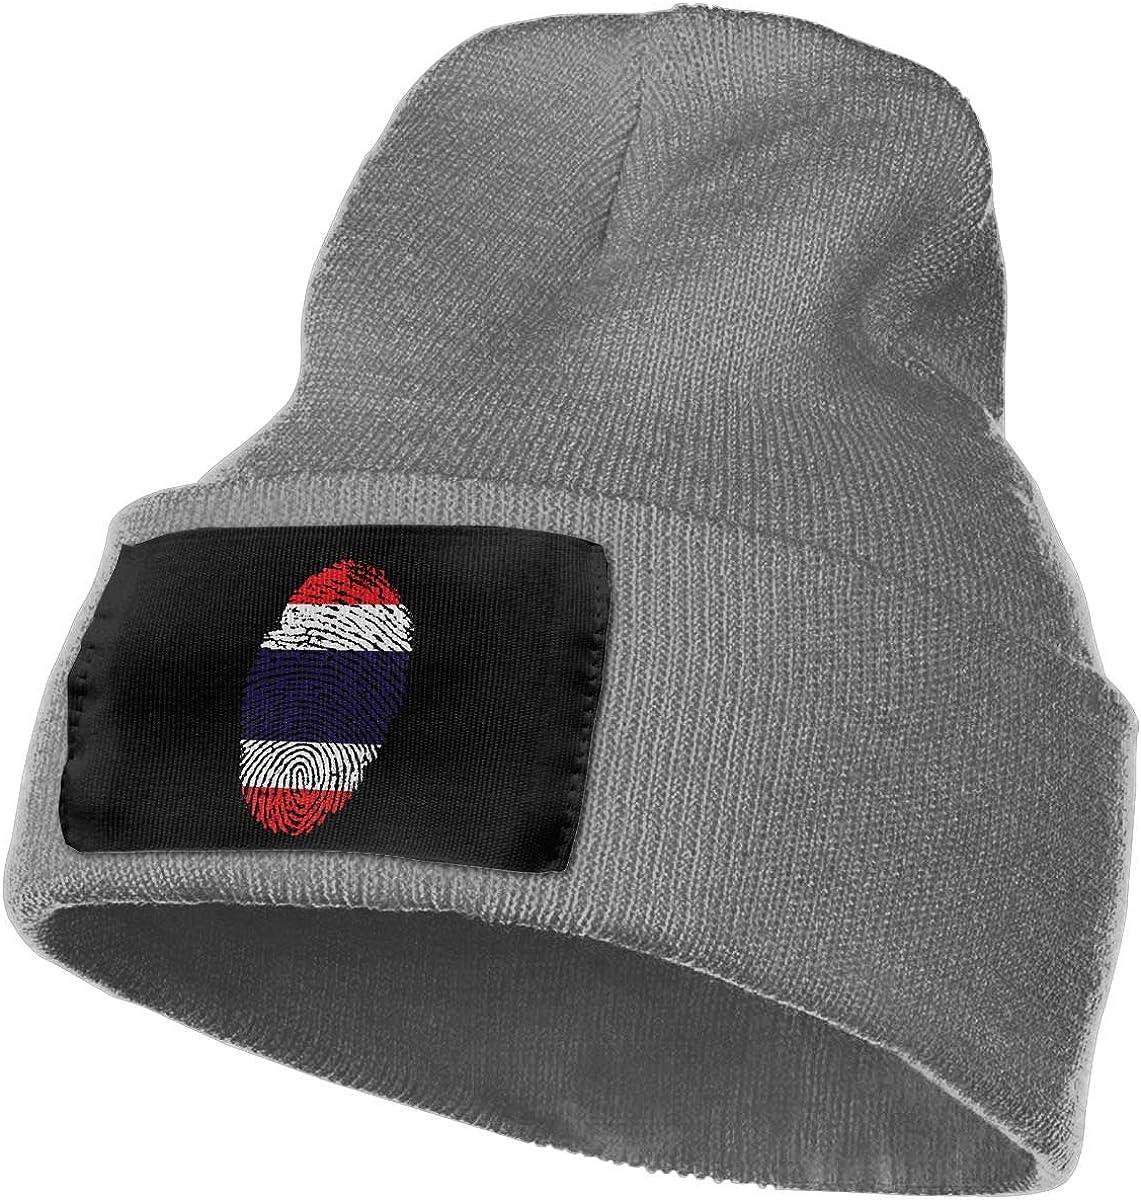 SLADDD1 Church Warm Winter Hat Knit Beanie Skull Cap Cuff Beanie Hat Winter Hats for Men /& Women